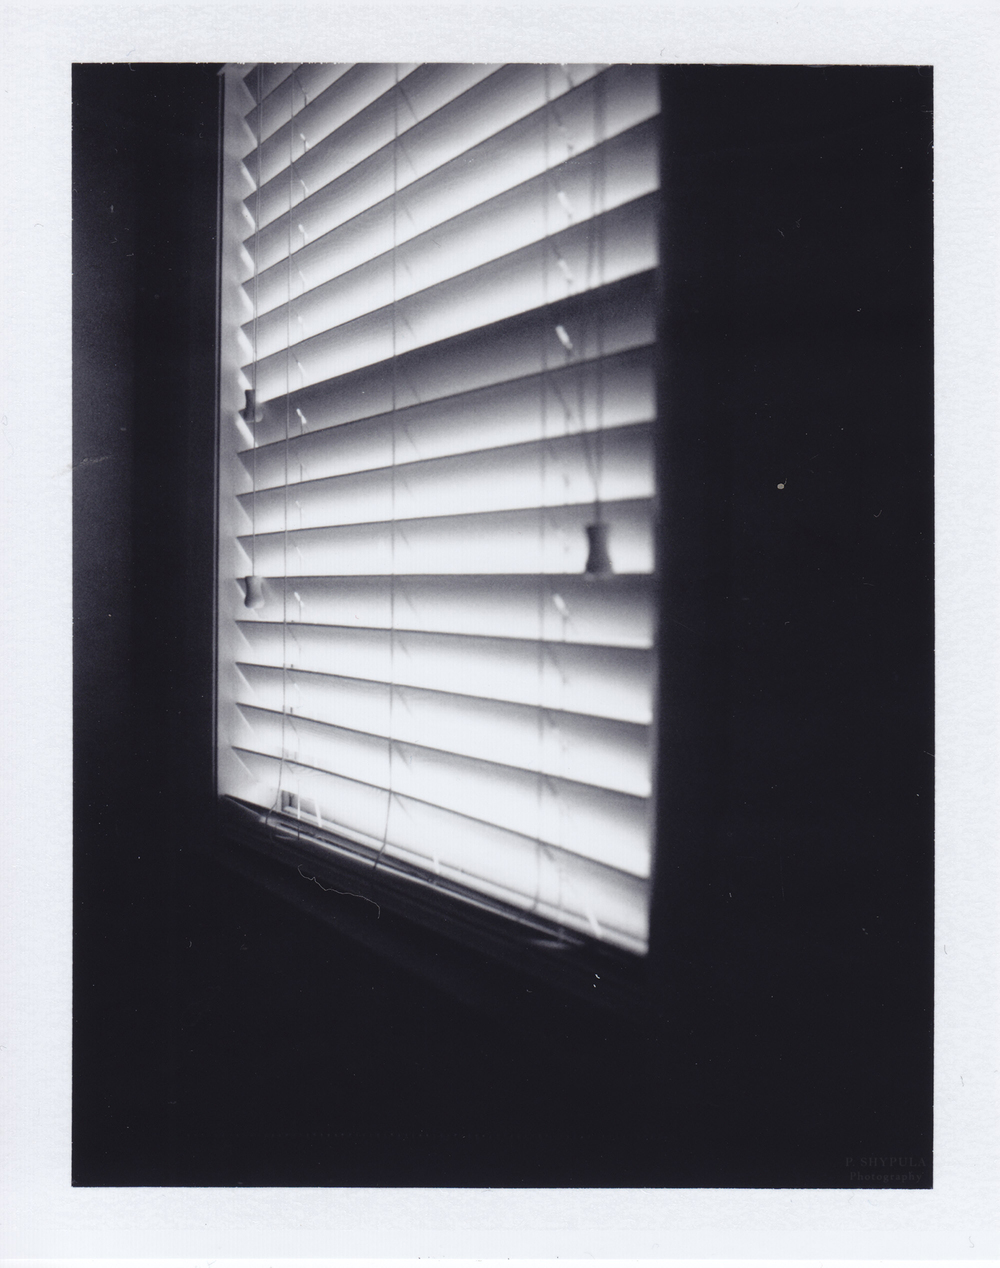 Week 4: Jan 25 - 31   Polaroid  Land 100 +  Fuji Photo Film  FP-3000b